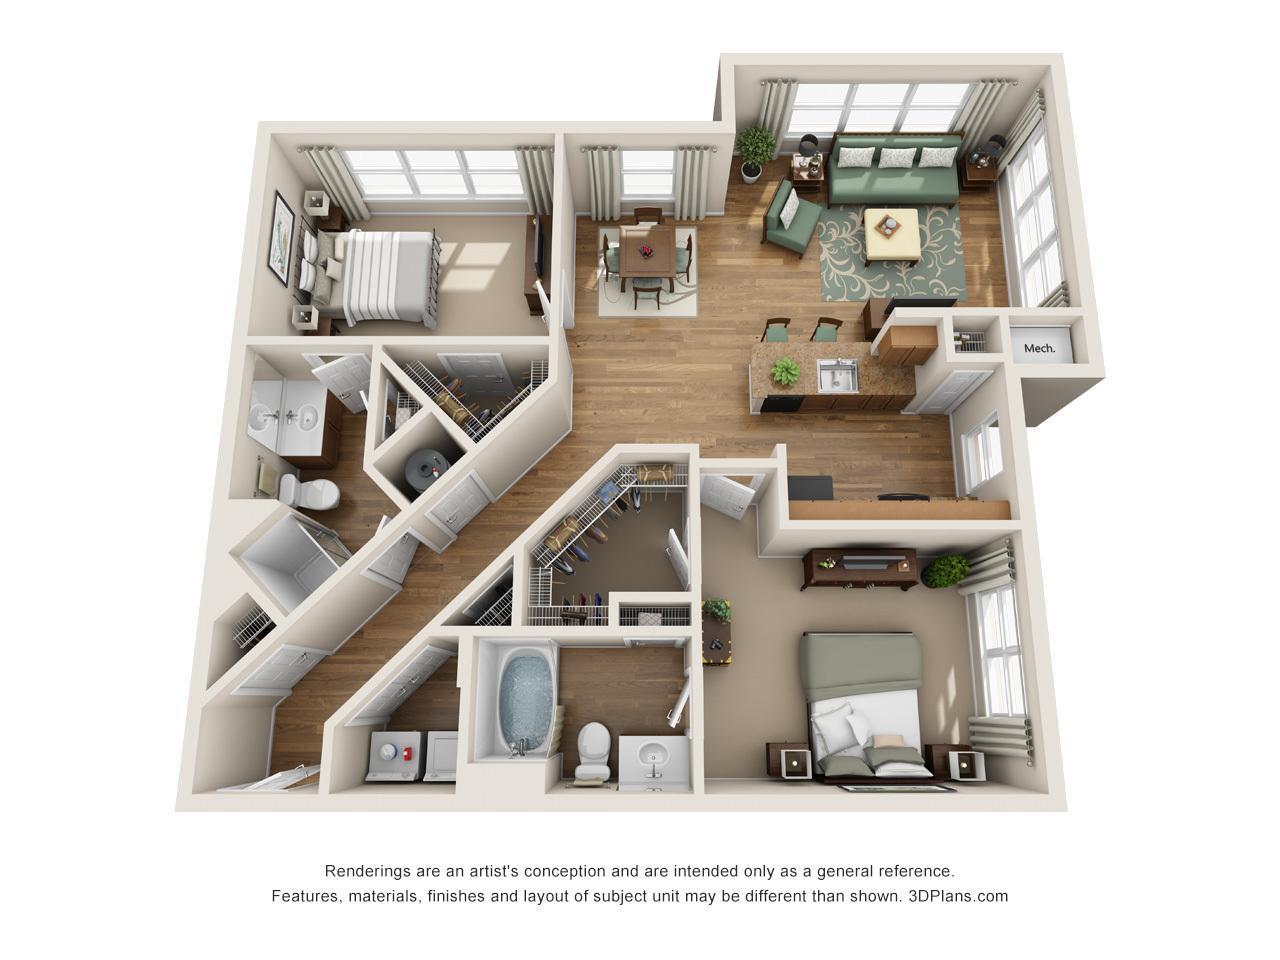 Landover md apartments century summerfield morgan metro for Japanese apartment floor plan